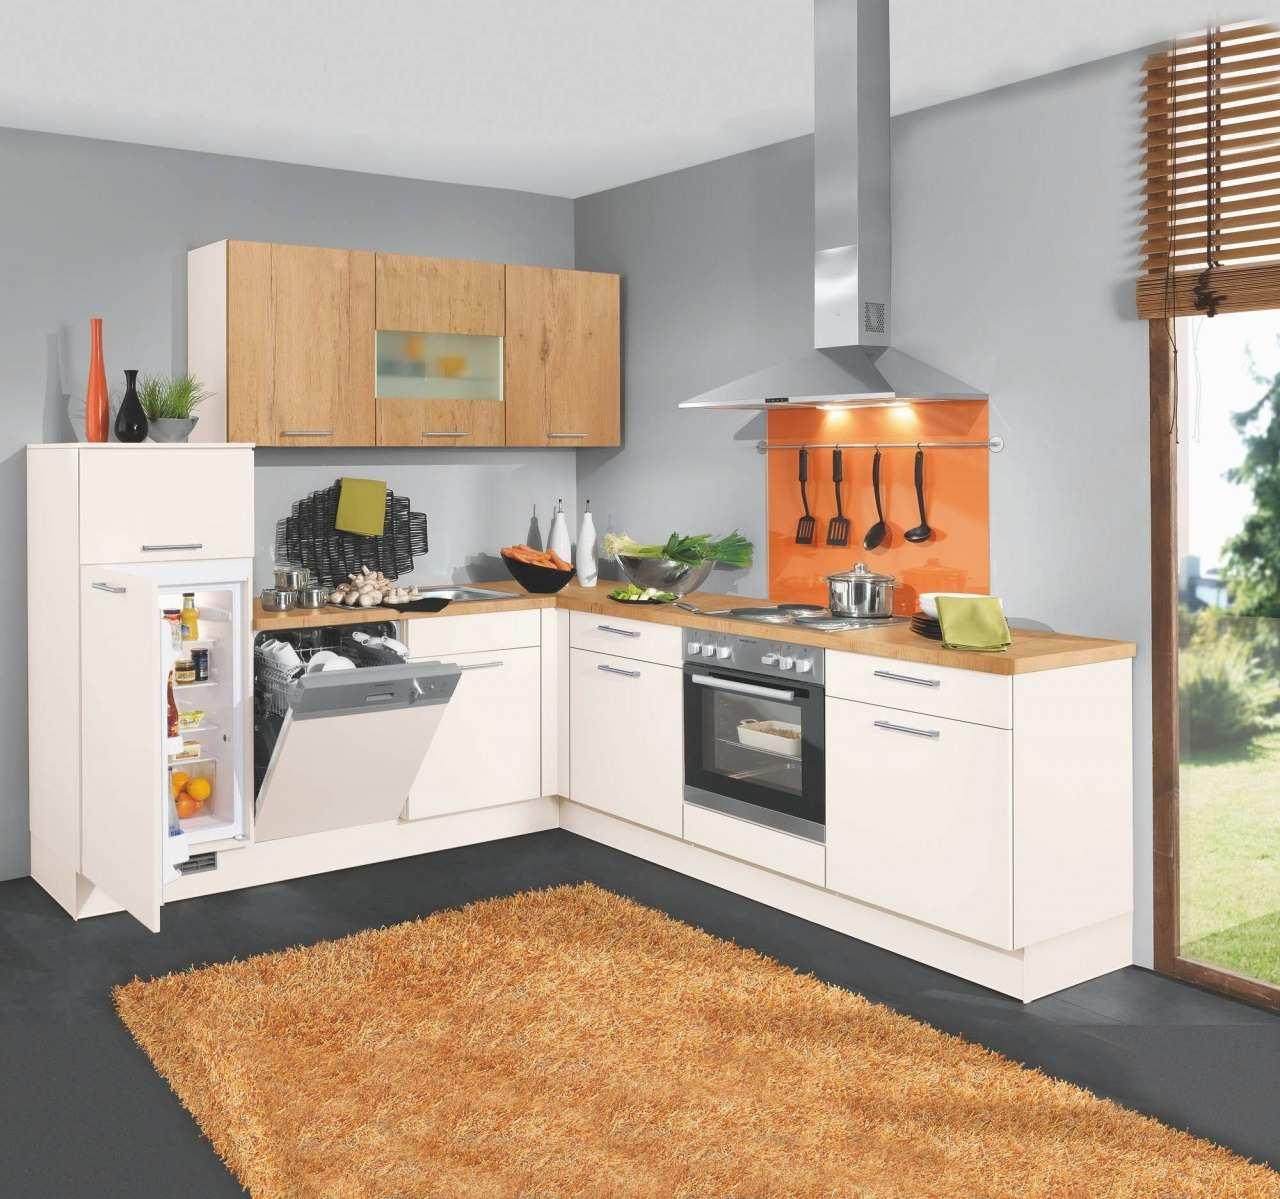 moderne kuche deko elegant kuche deko selber machen kuche de paris ideen von deko gunstig kaufen of deko gunstig kaufen